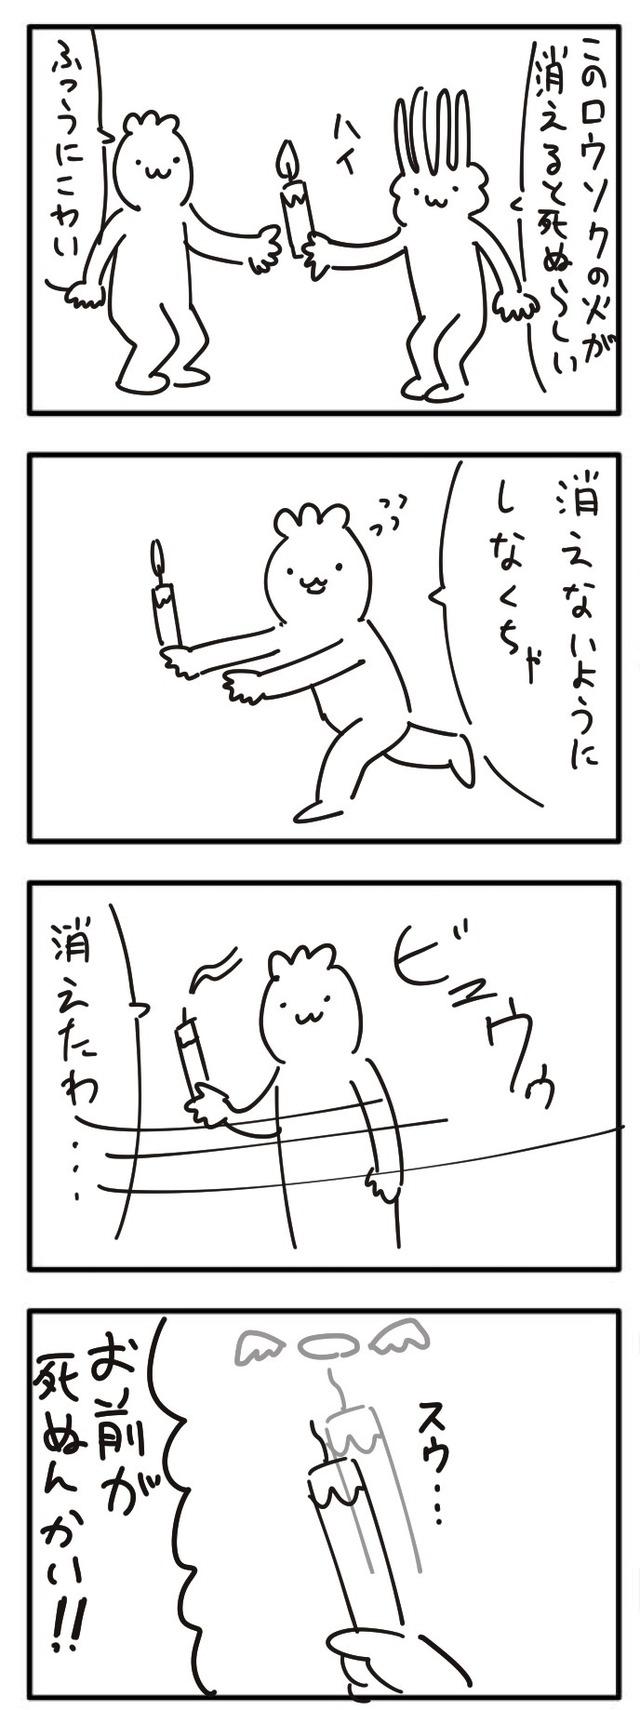 20140106165016_843_1